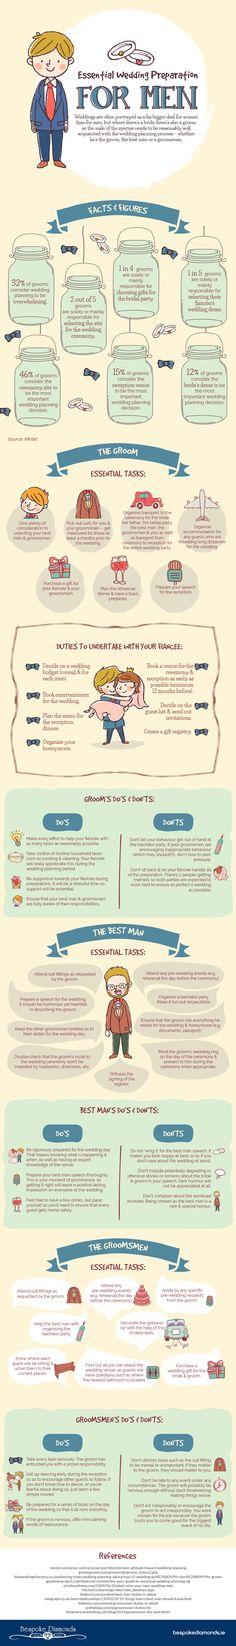 Essential Wedding Preparation for Men #Infographic #LifeStyle #Wedding